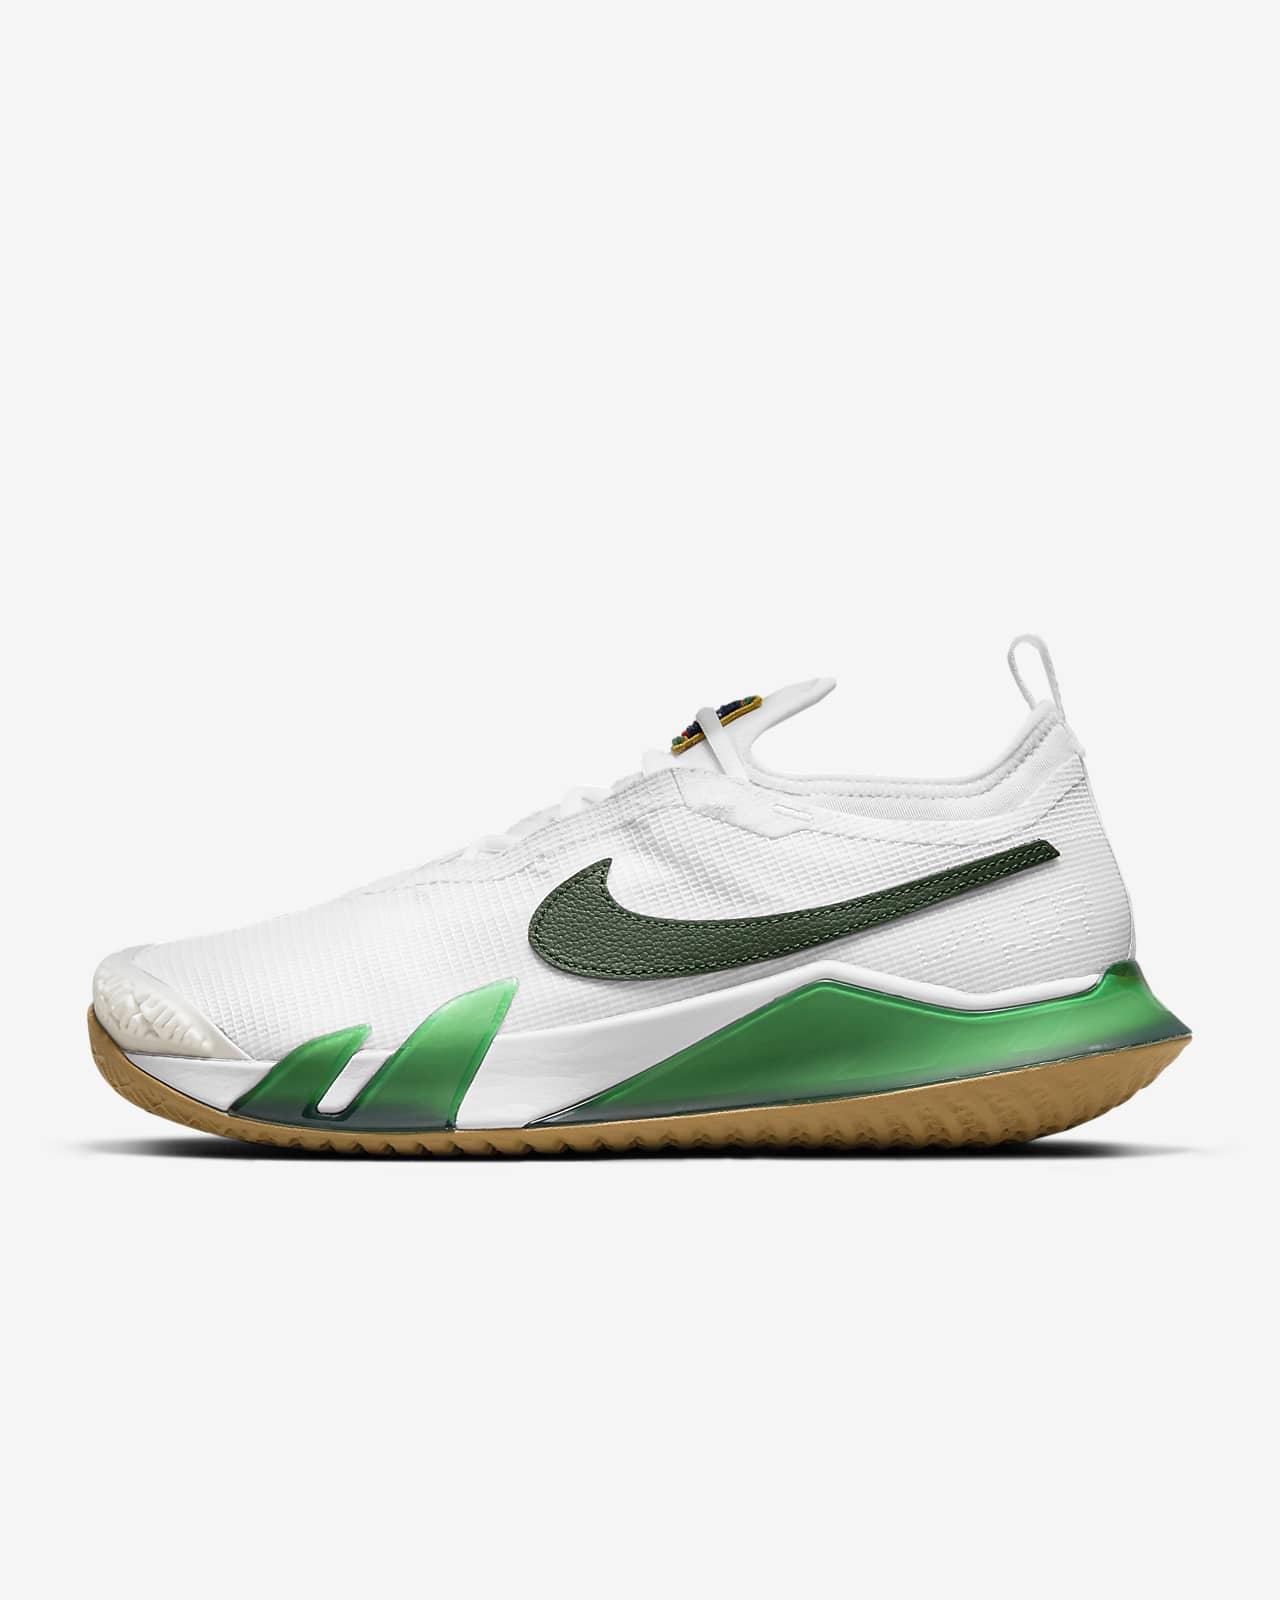 NikeCourt React Vapor NXT Men's Hard-Court Tennis Shoe